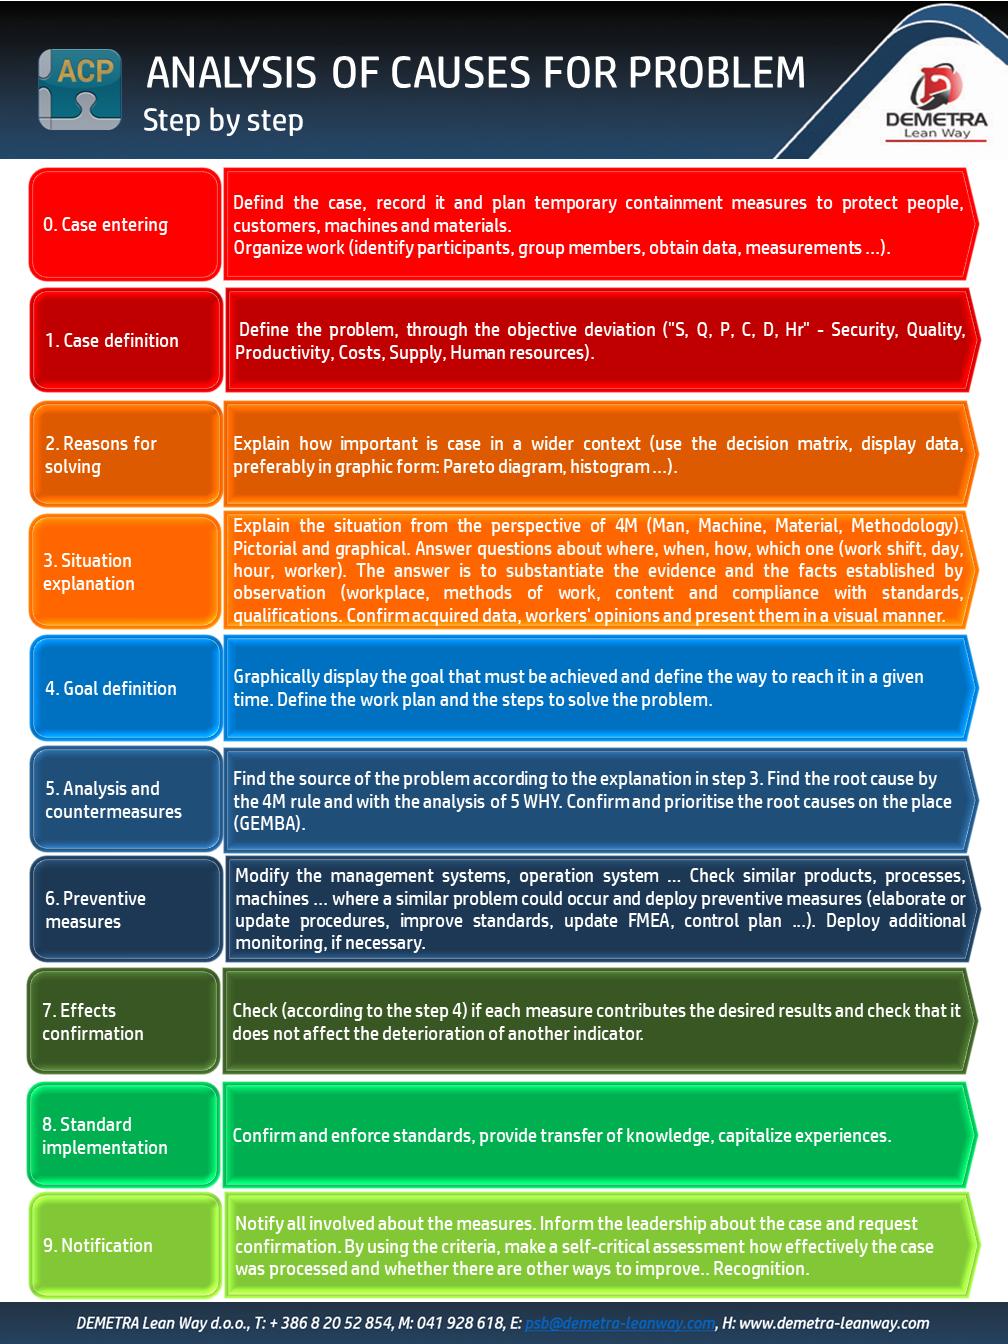 ACP analysis of causes for problem step description